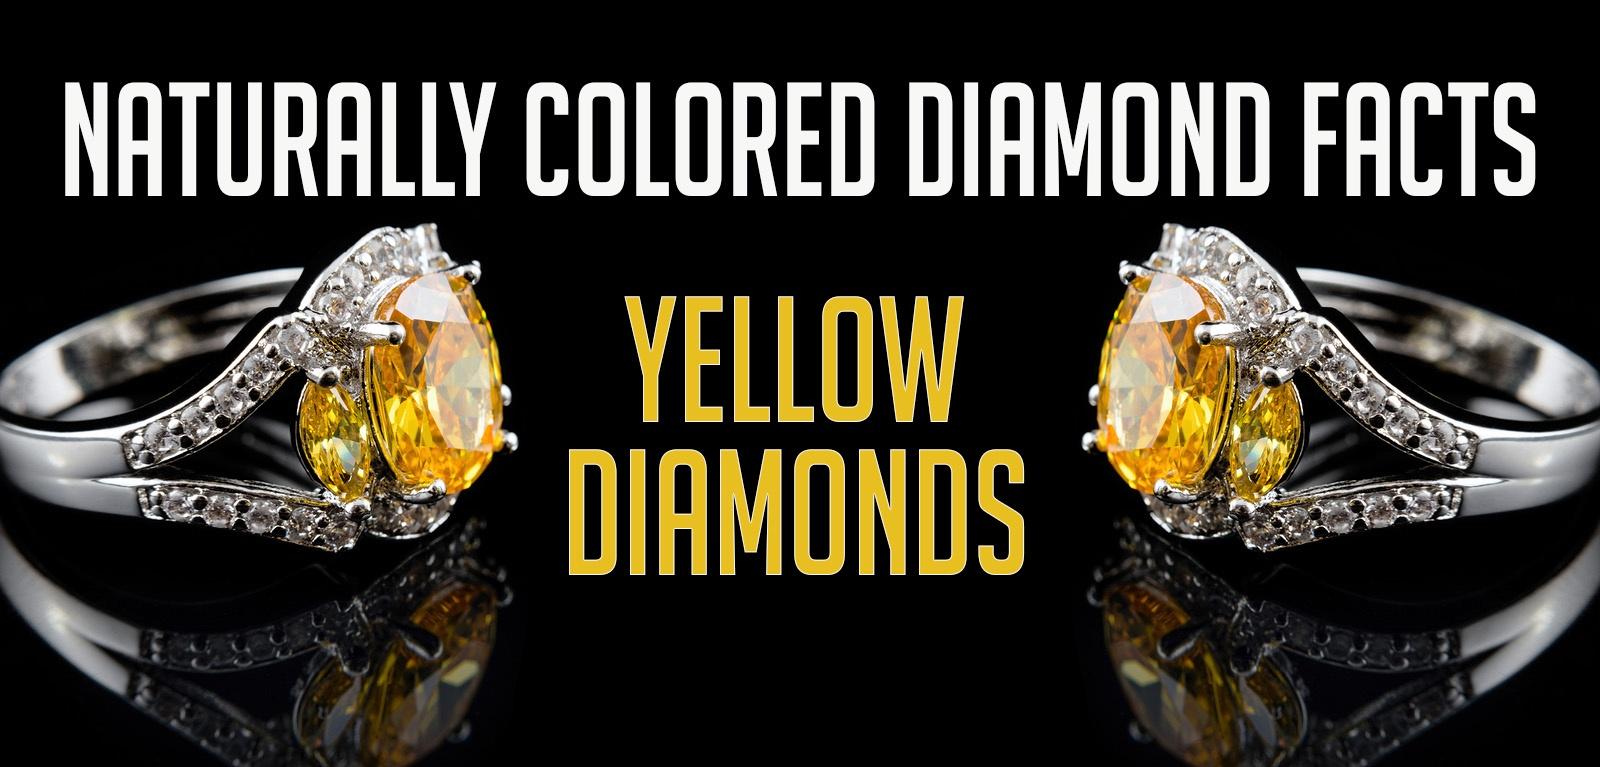 naturally colored diamond facts yellow diamonds.jpg